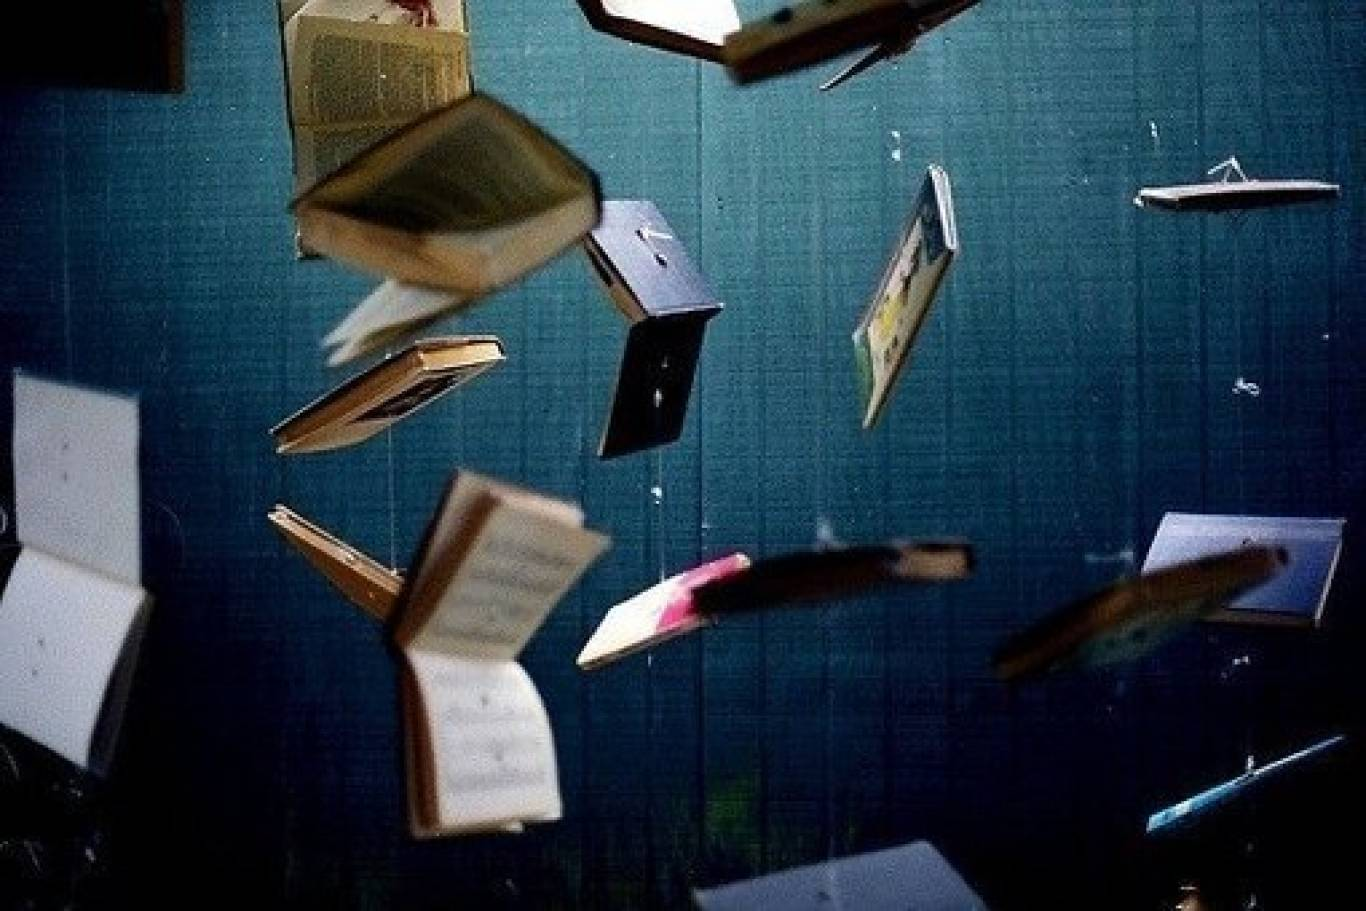 Літературна здибанка на Арт-пікніку